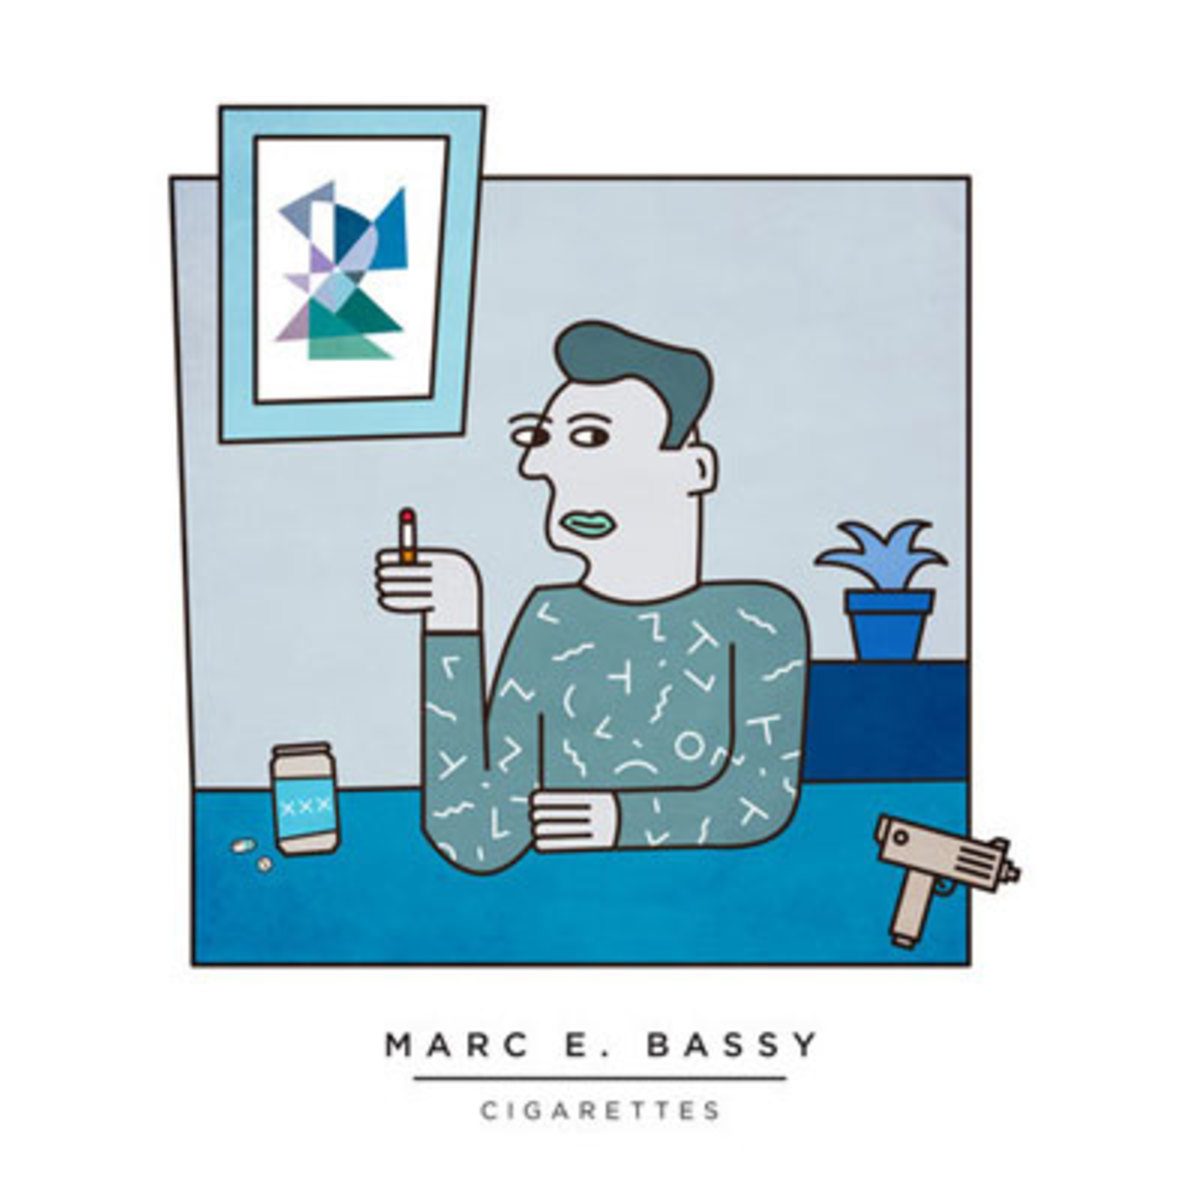 marcebassy-cigarettes.jpg